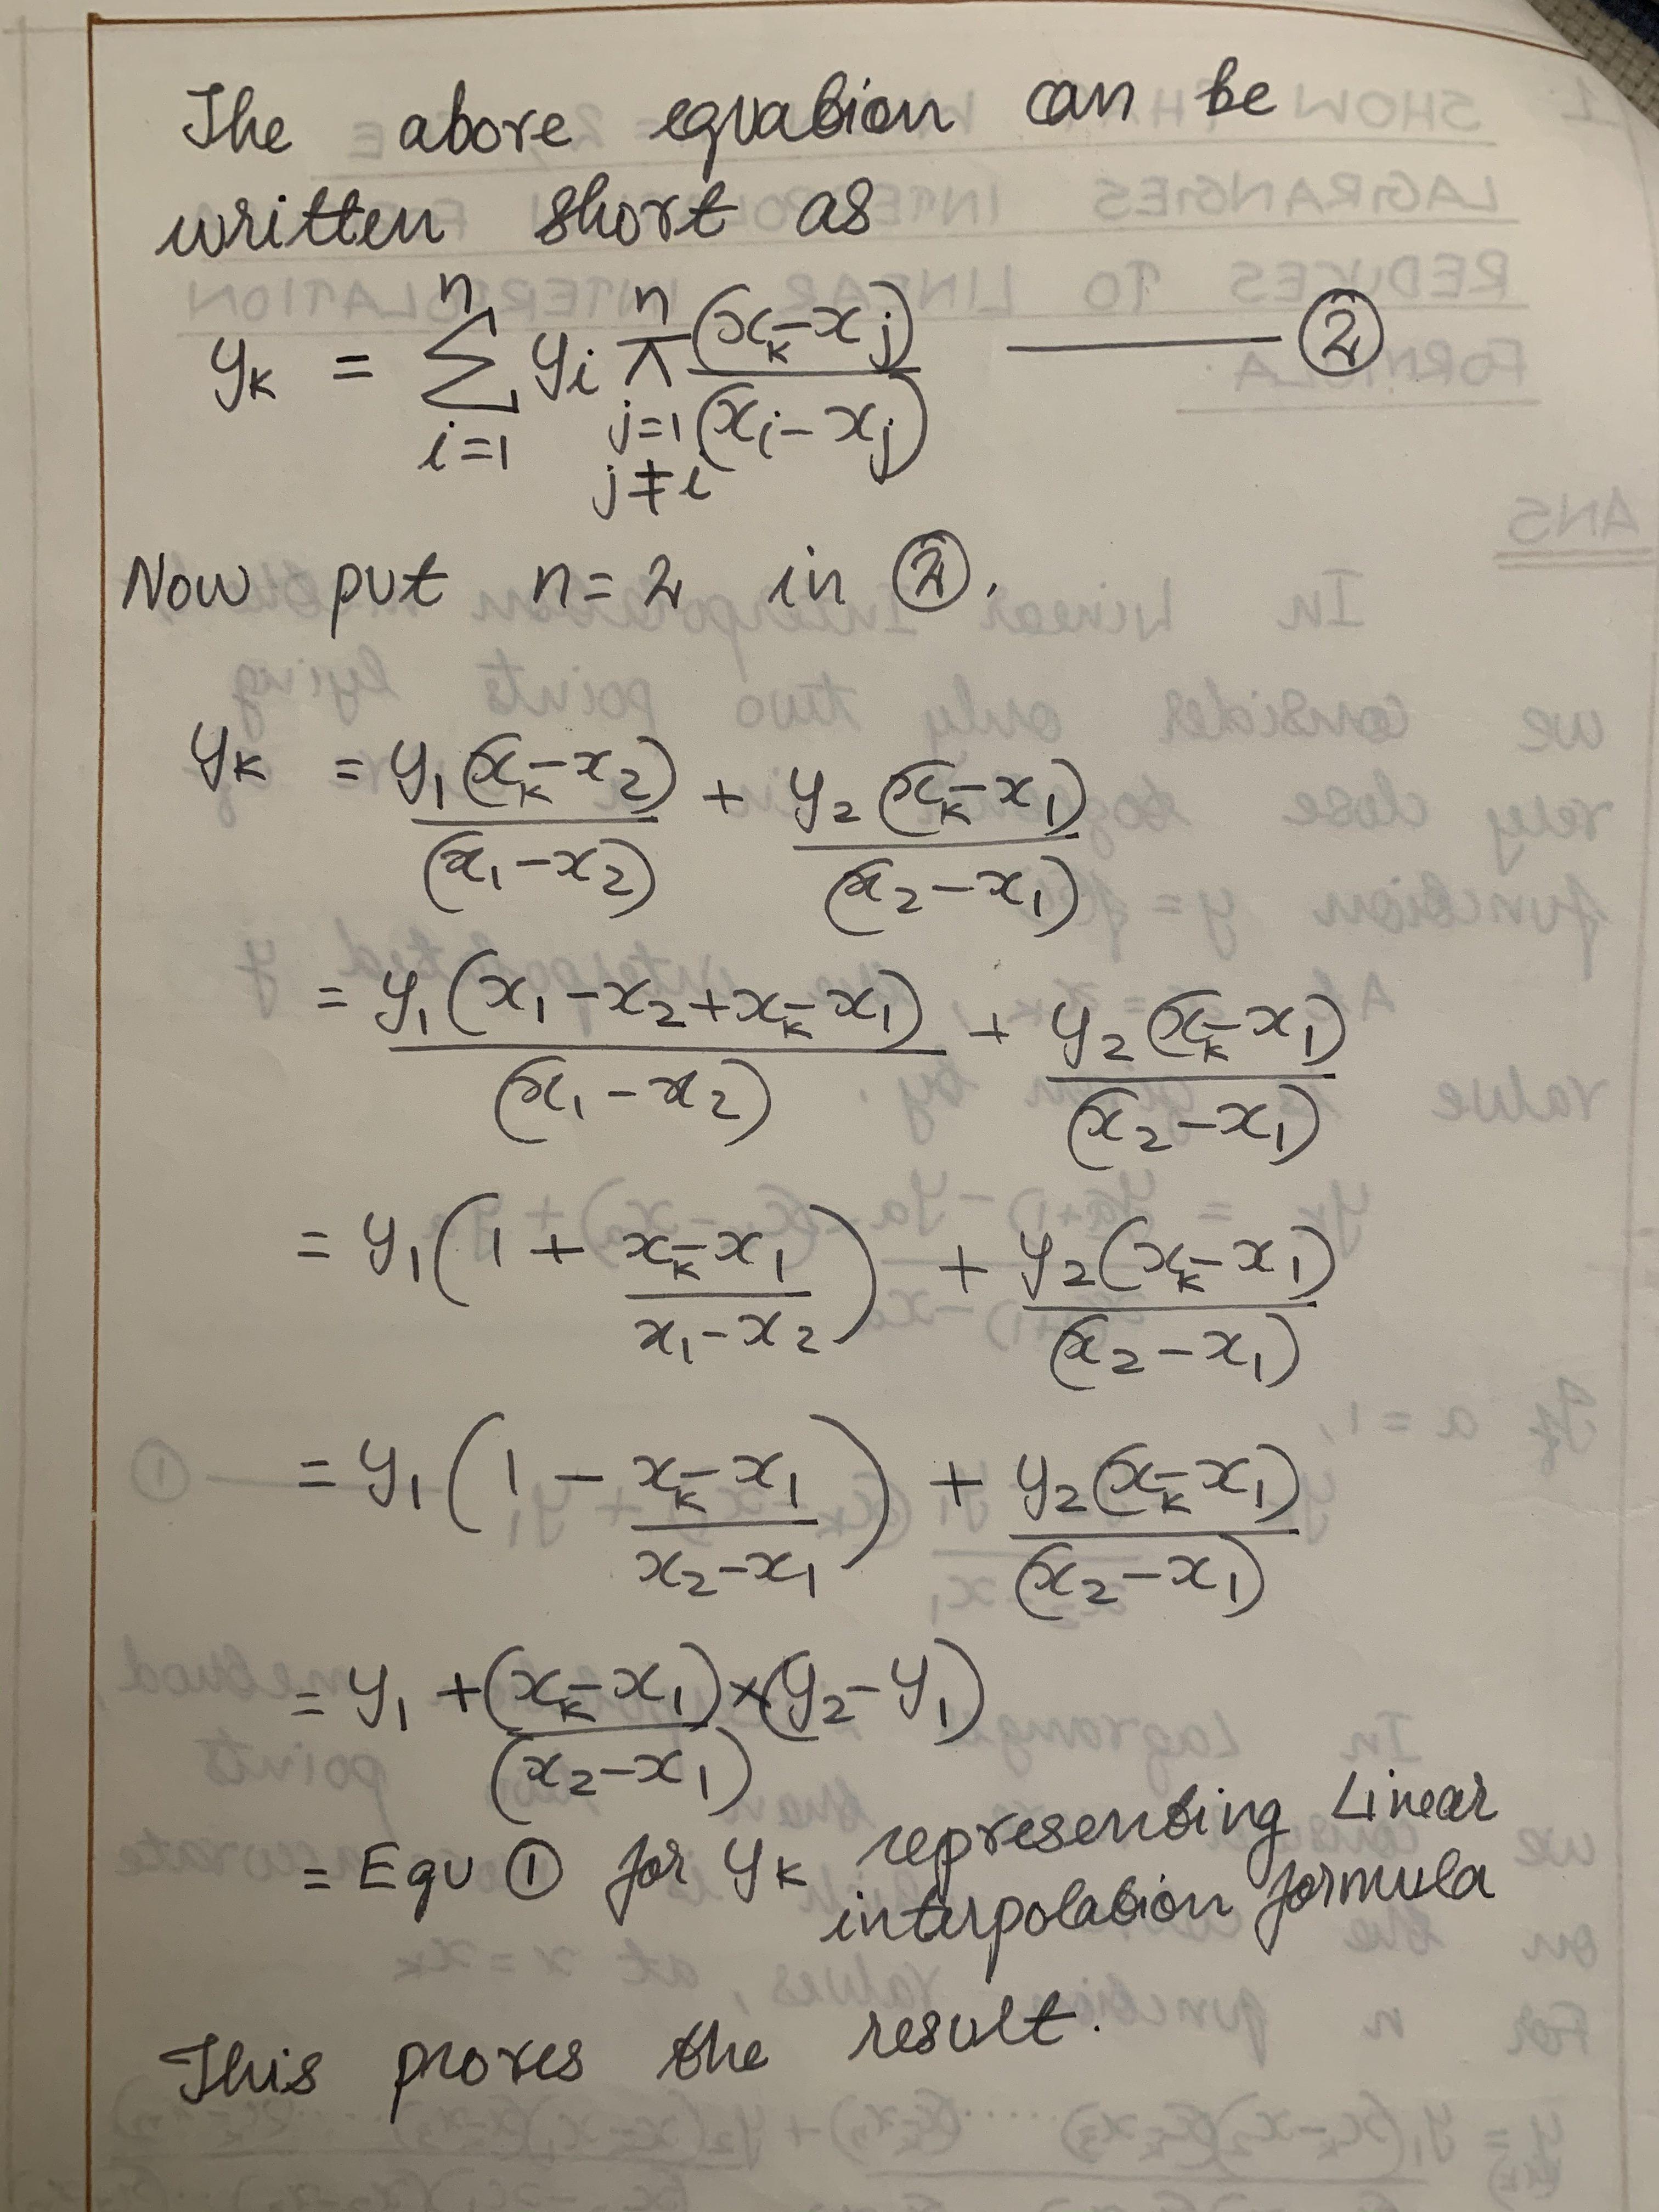 Lagranges interpolation formula to Linear interpolation